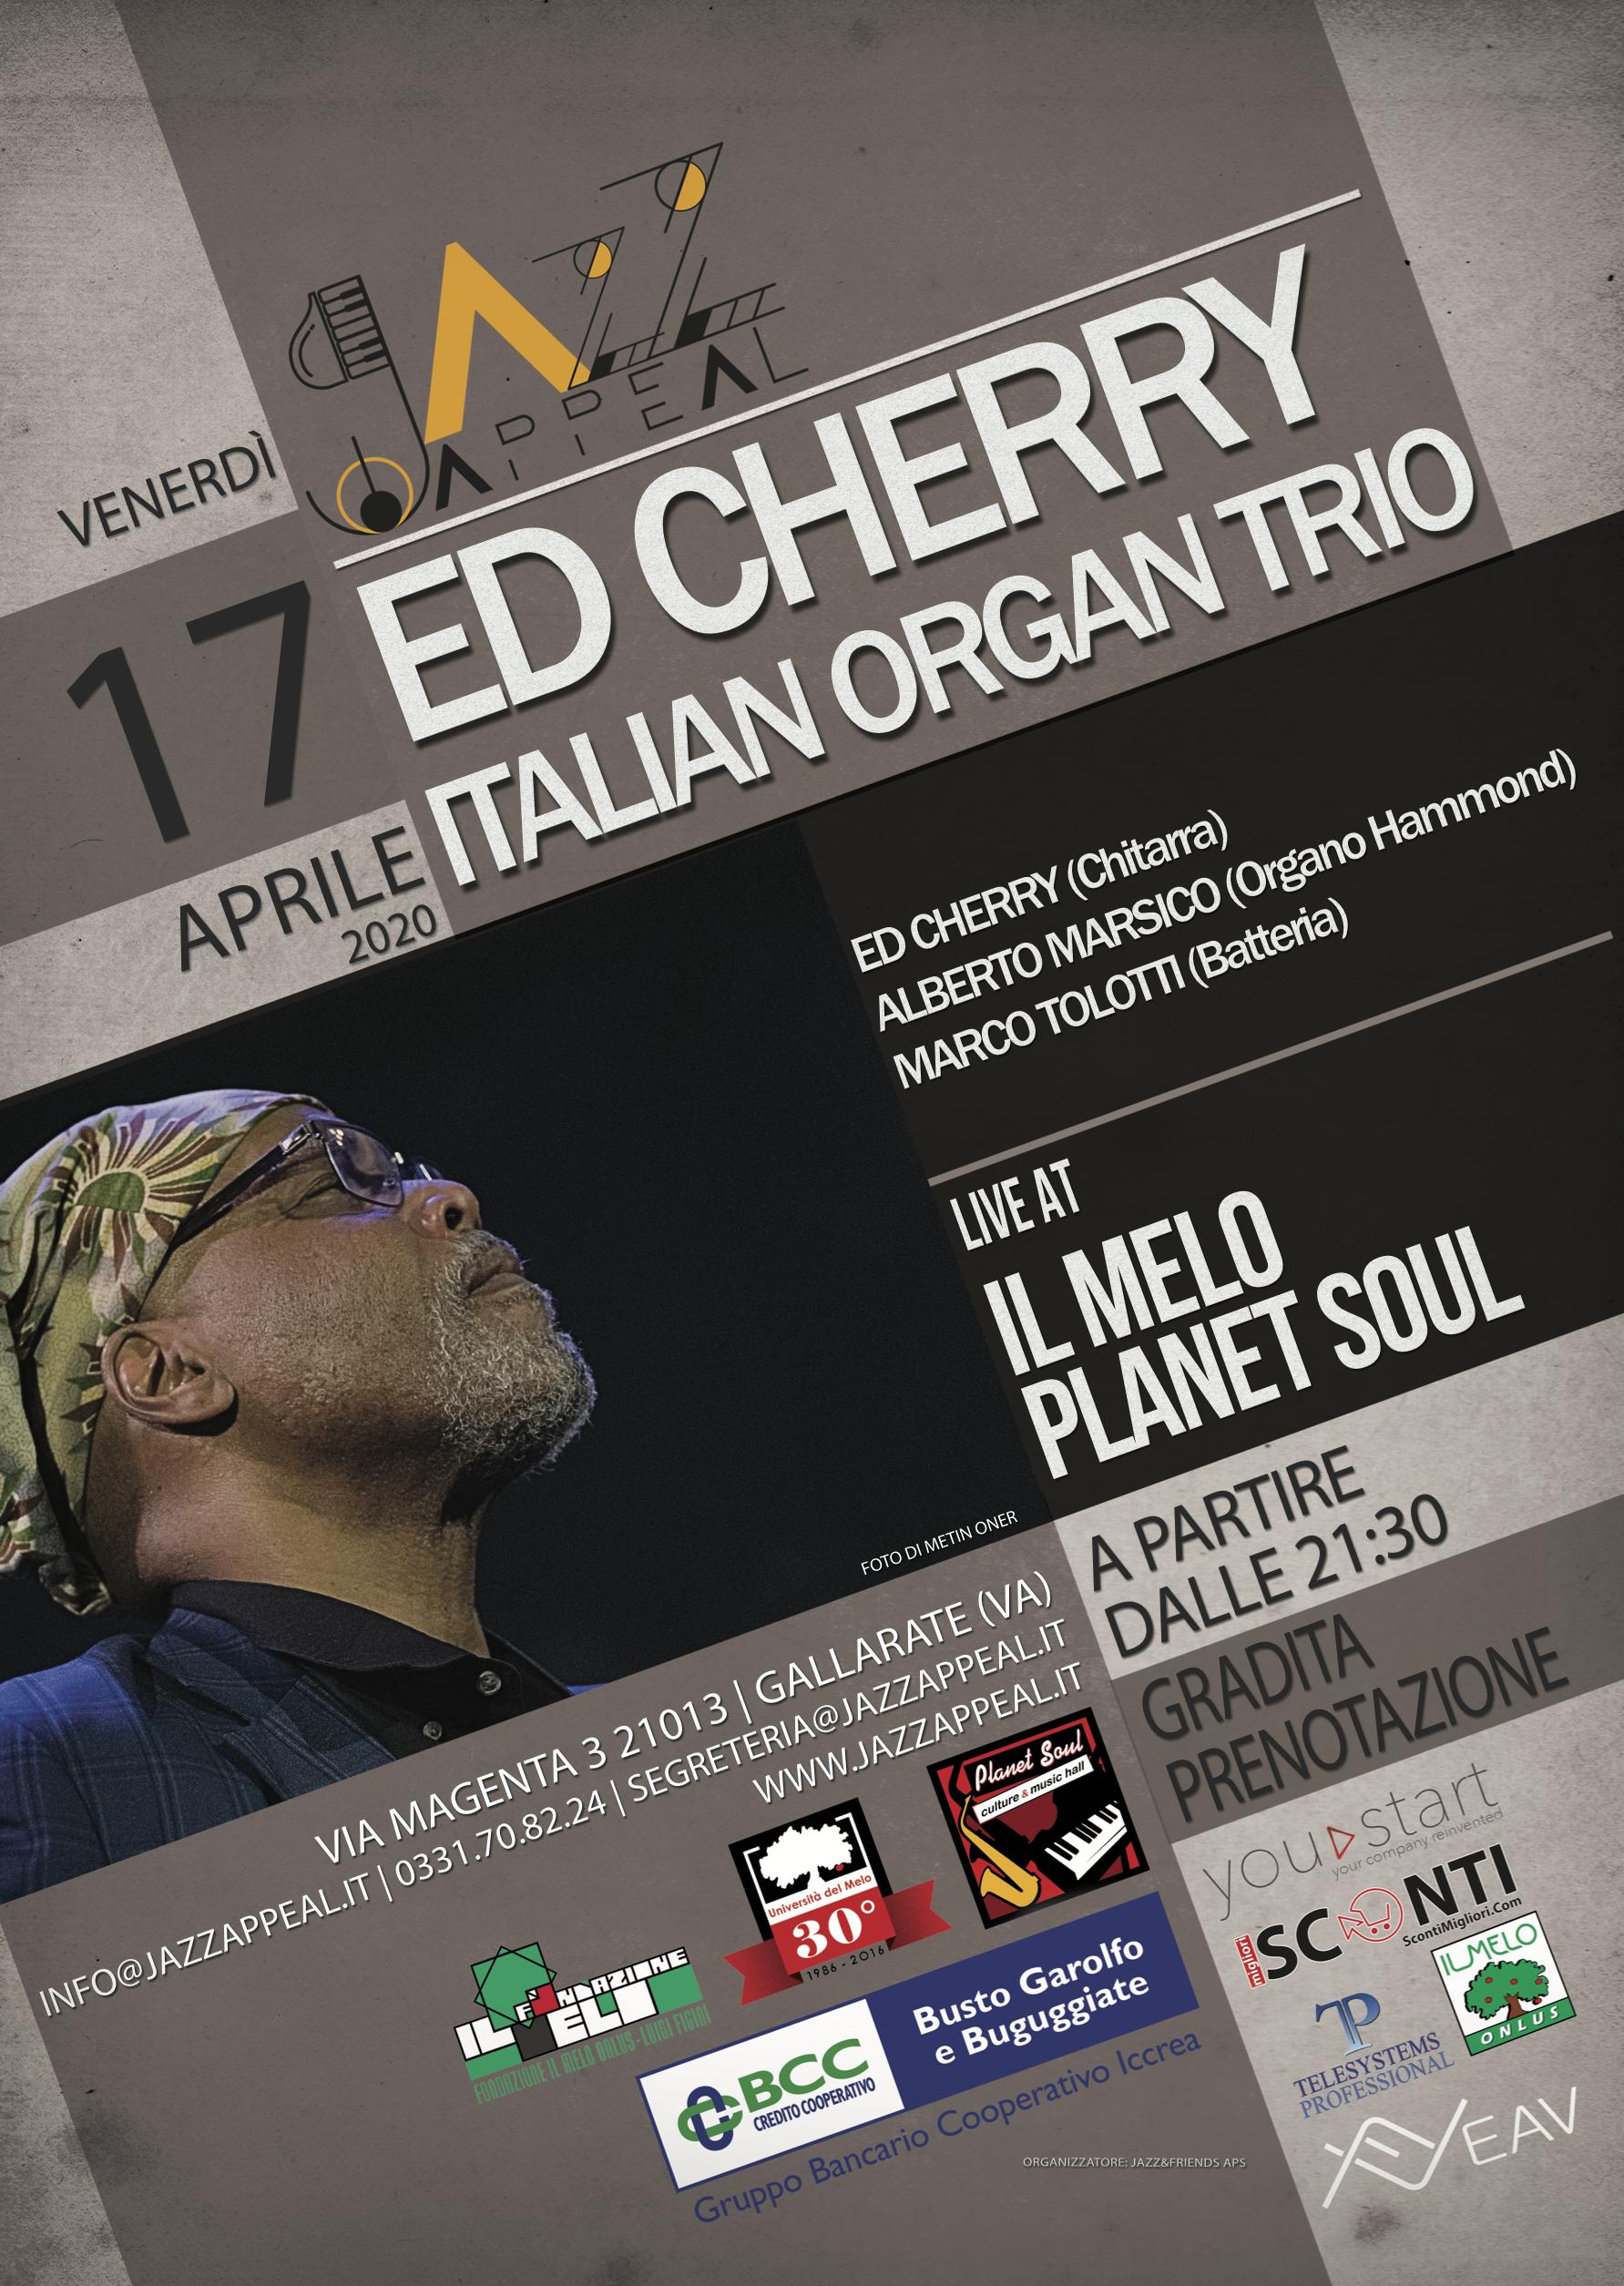 Ed Cherry Italian Organ Trio Jazz Appeal